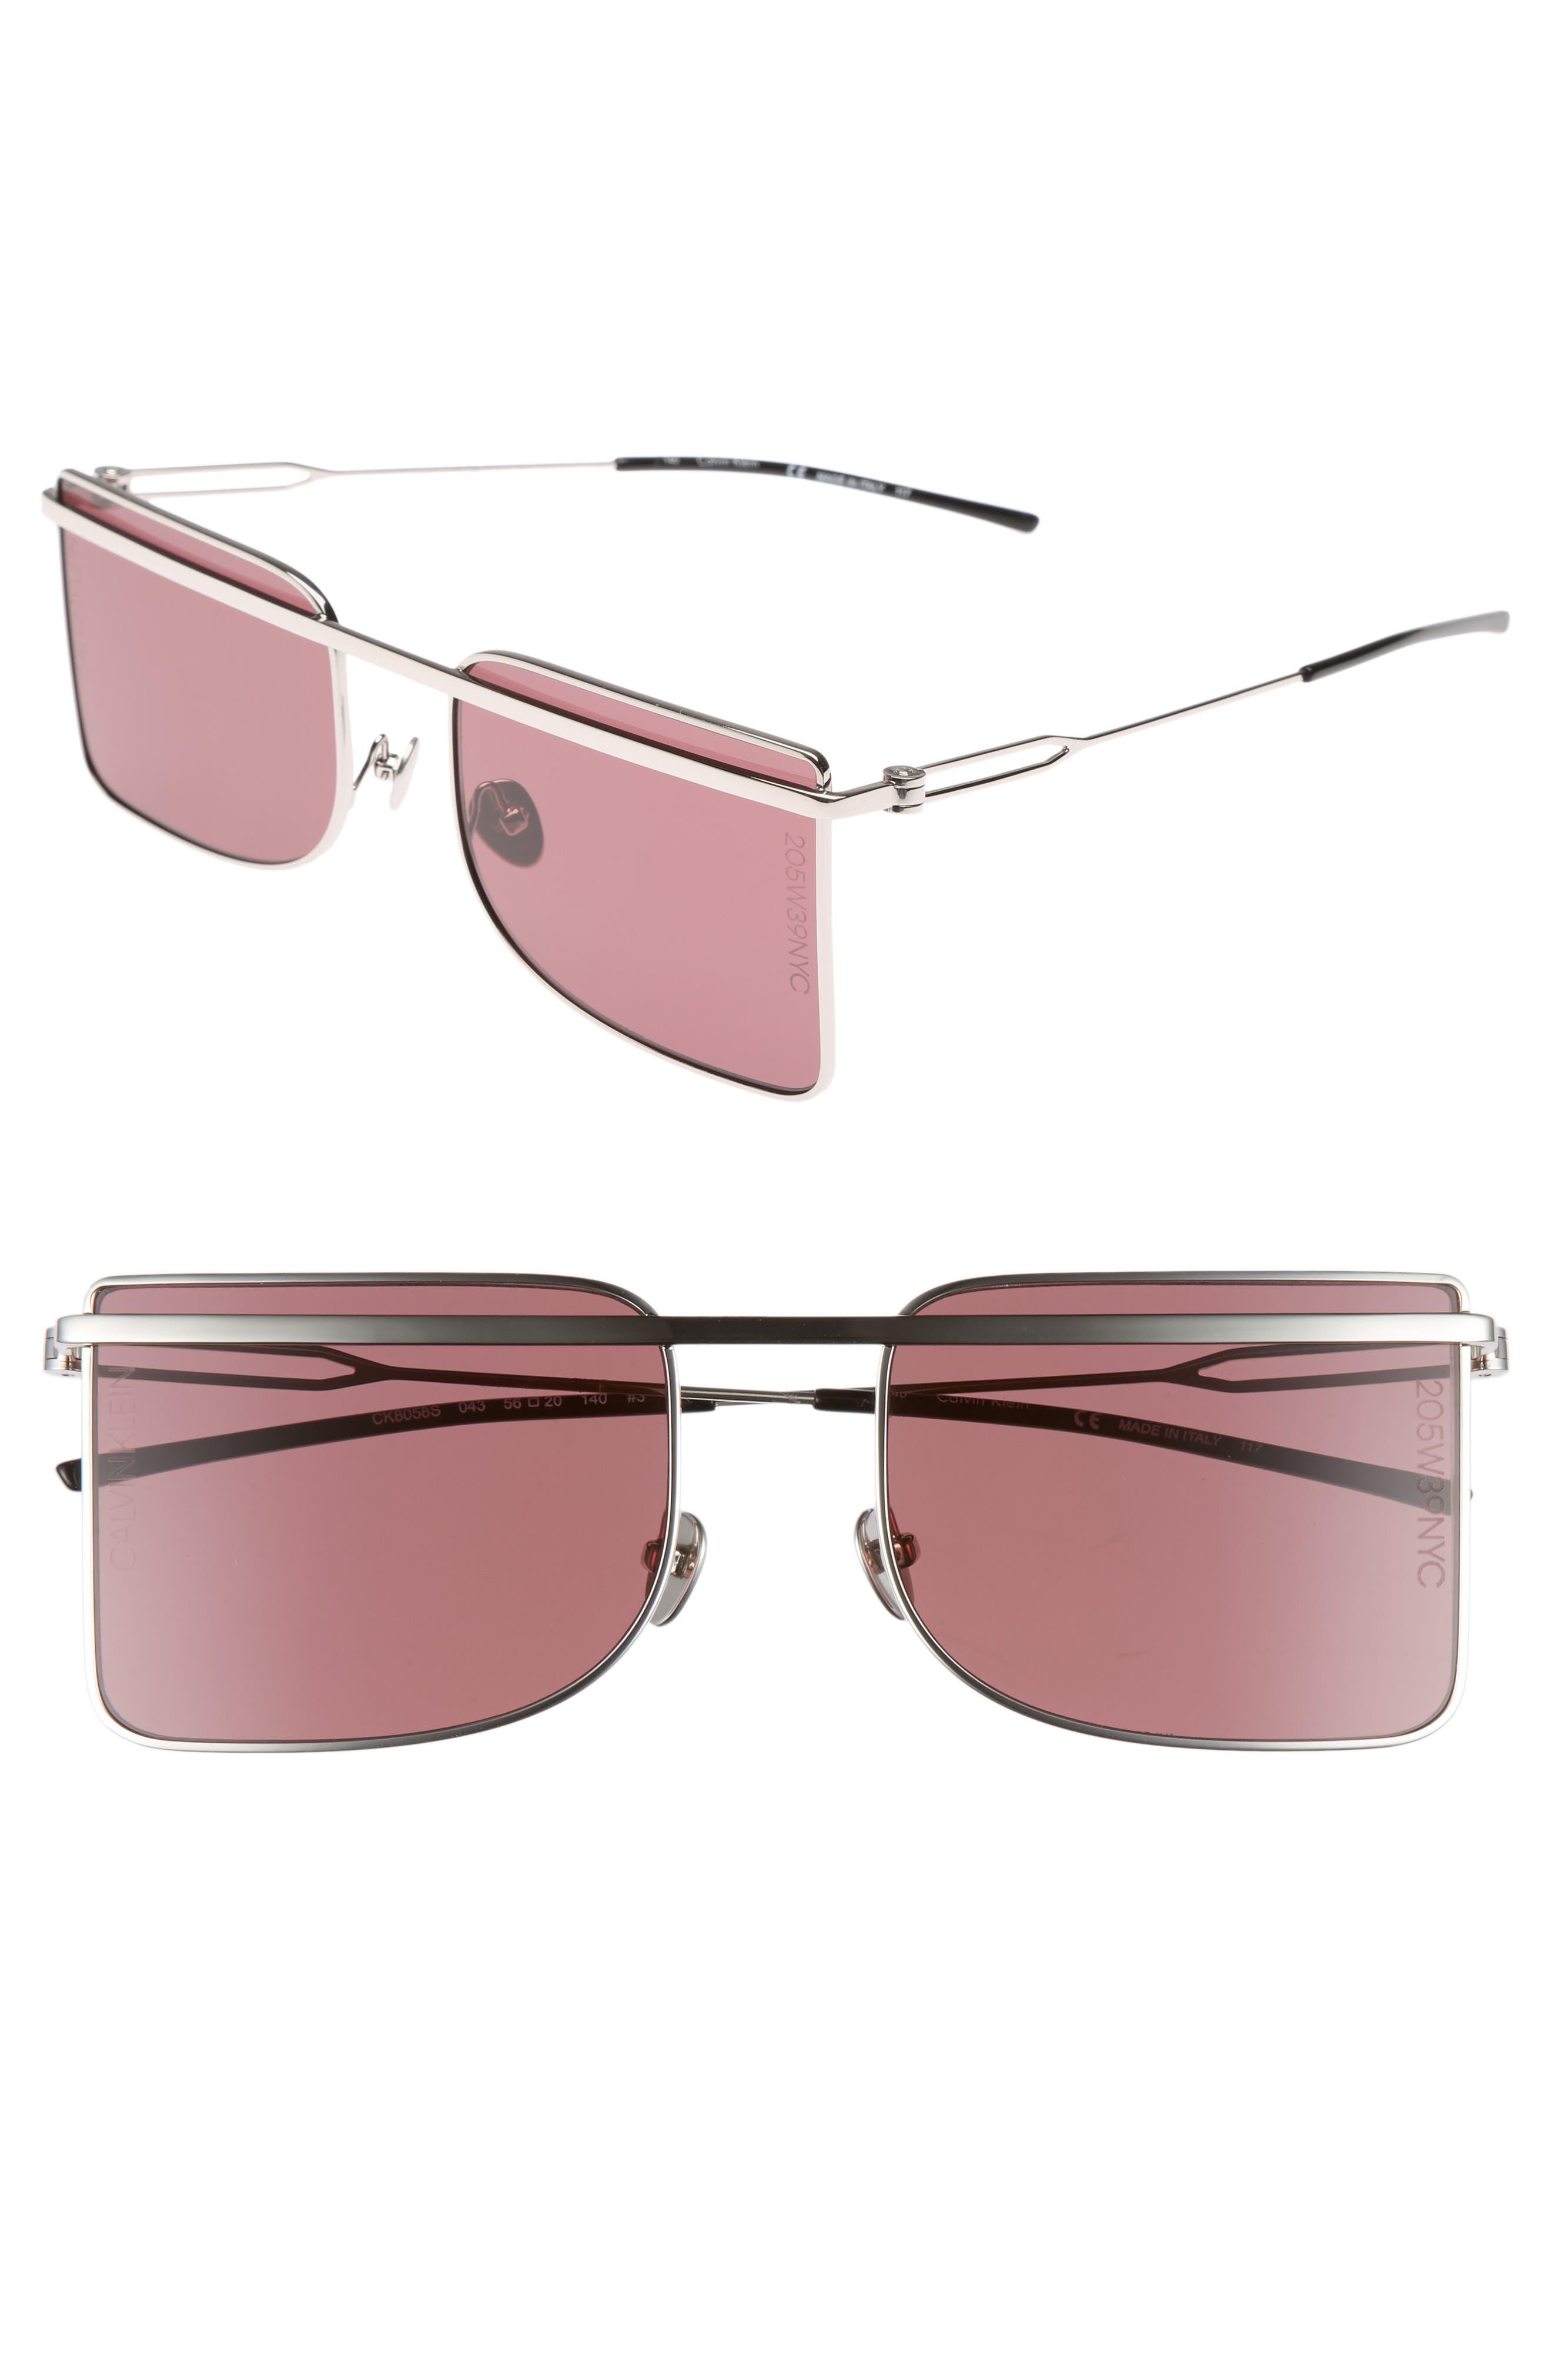 Calvin Klein 56mm Butterfly Sunglasses